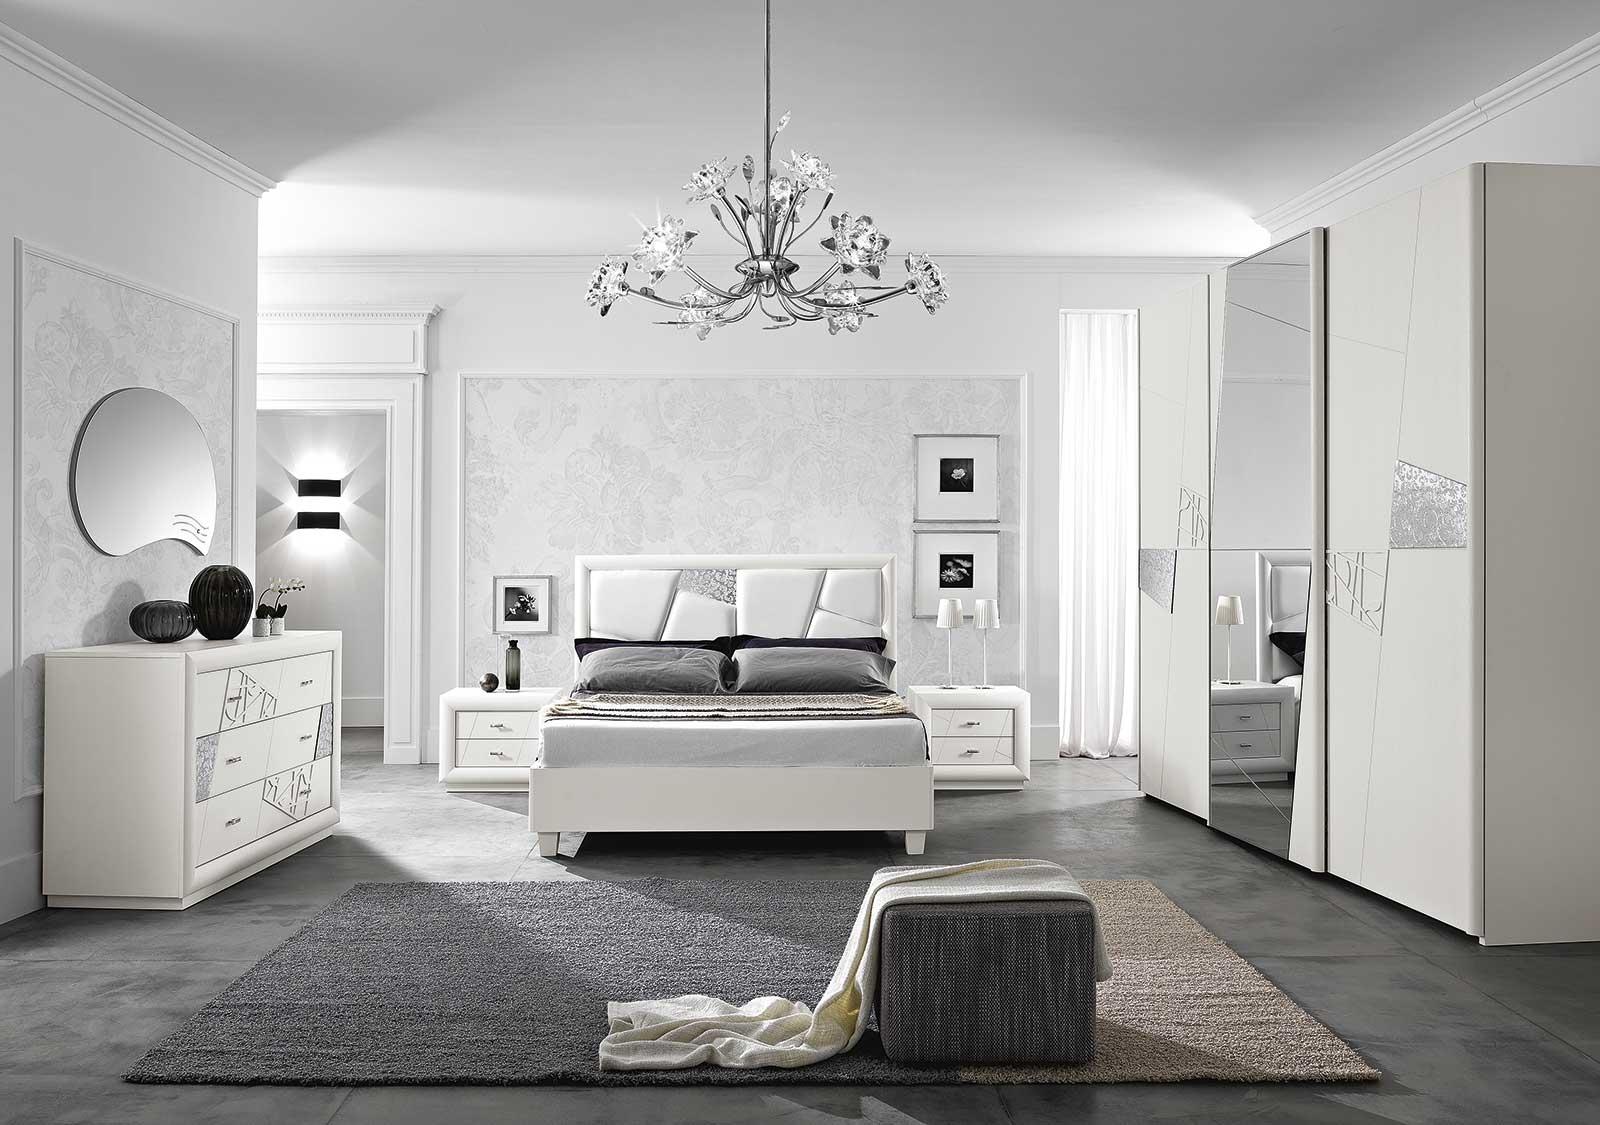 Camera chantal bianco contemporanee legno camera completa for Outlet arredamento bologna